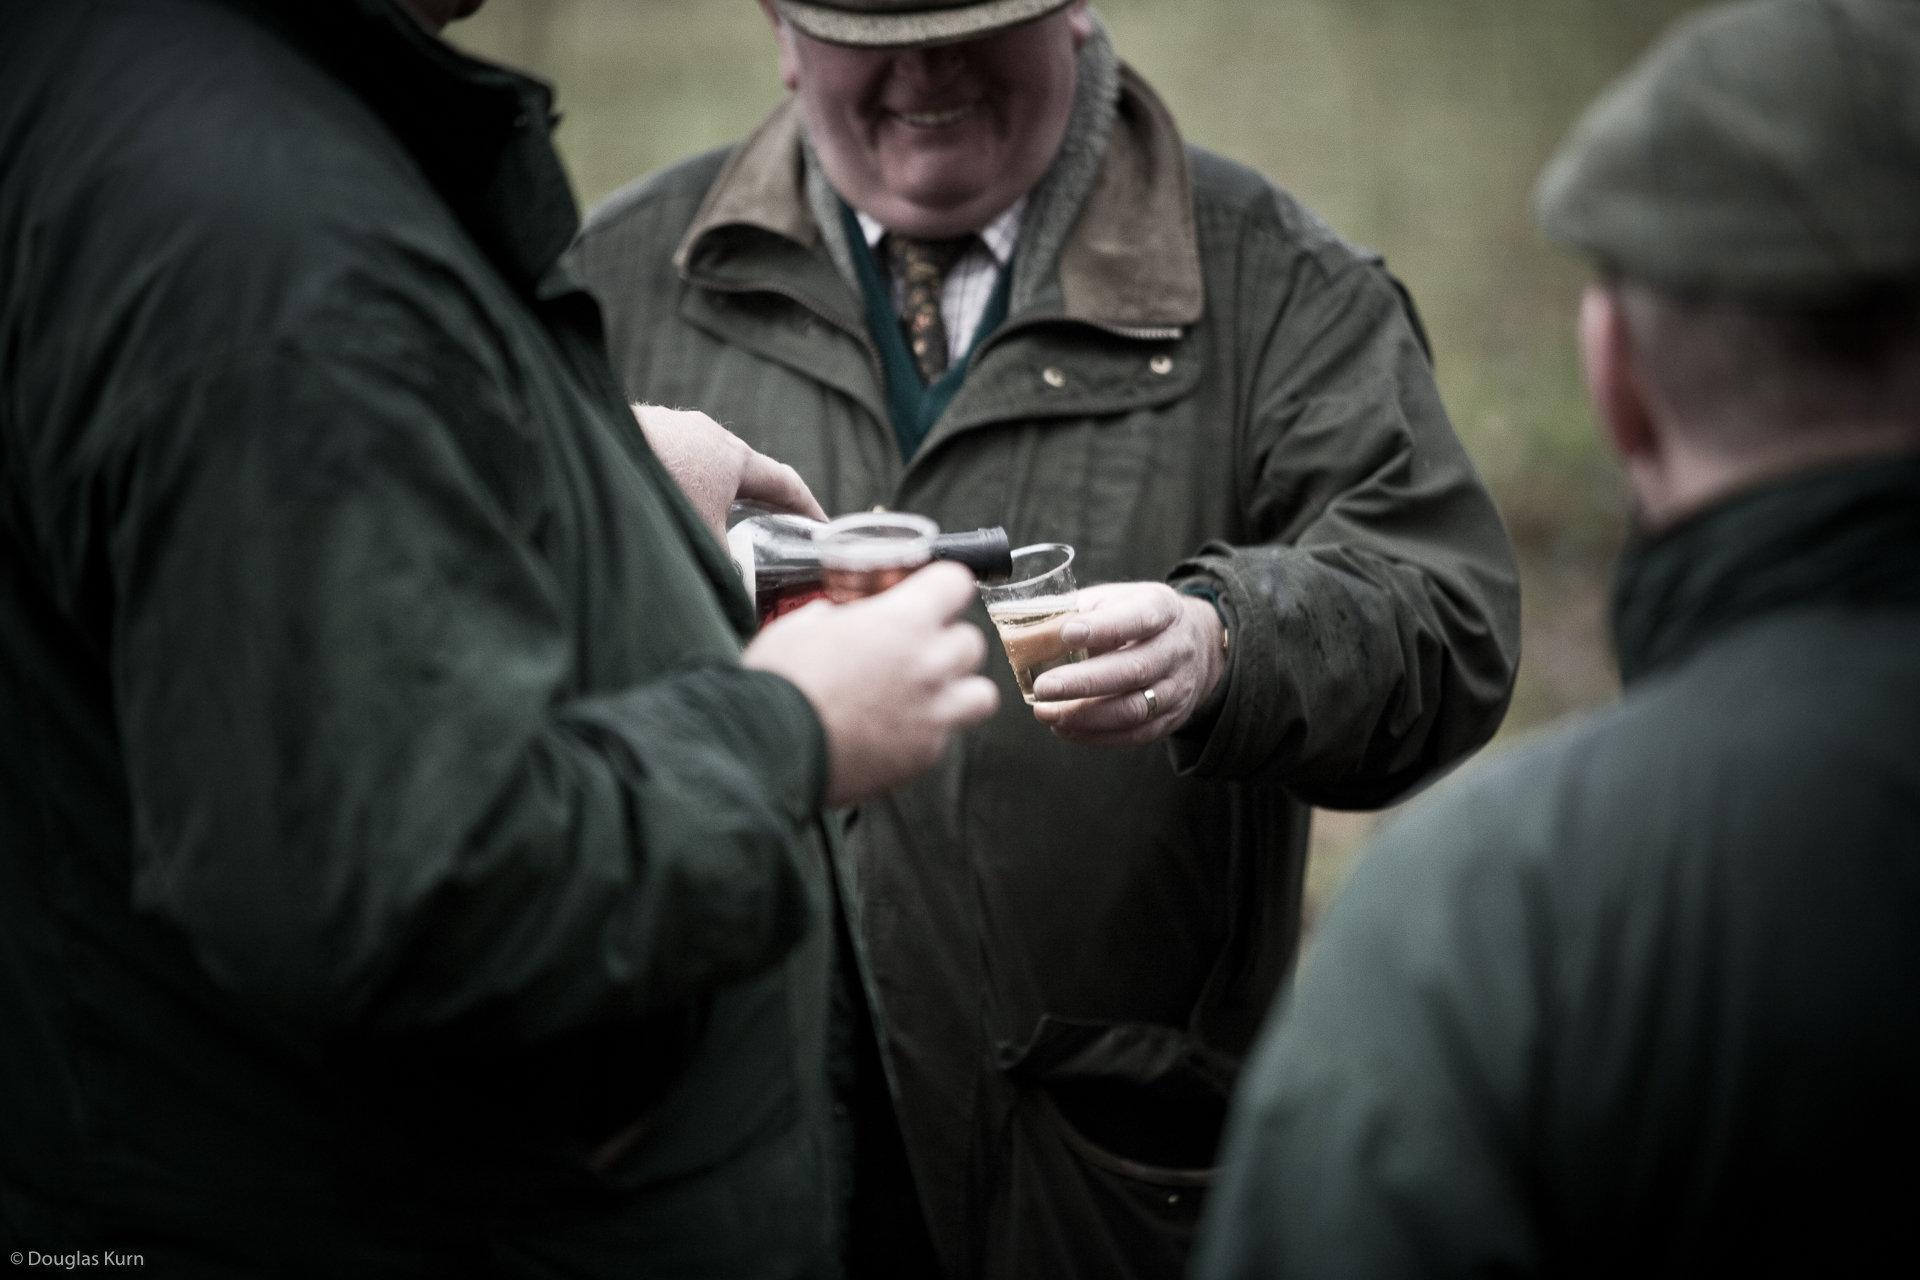 Nant Clwyd Shoot, December 27th 2006